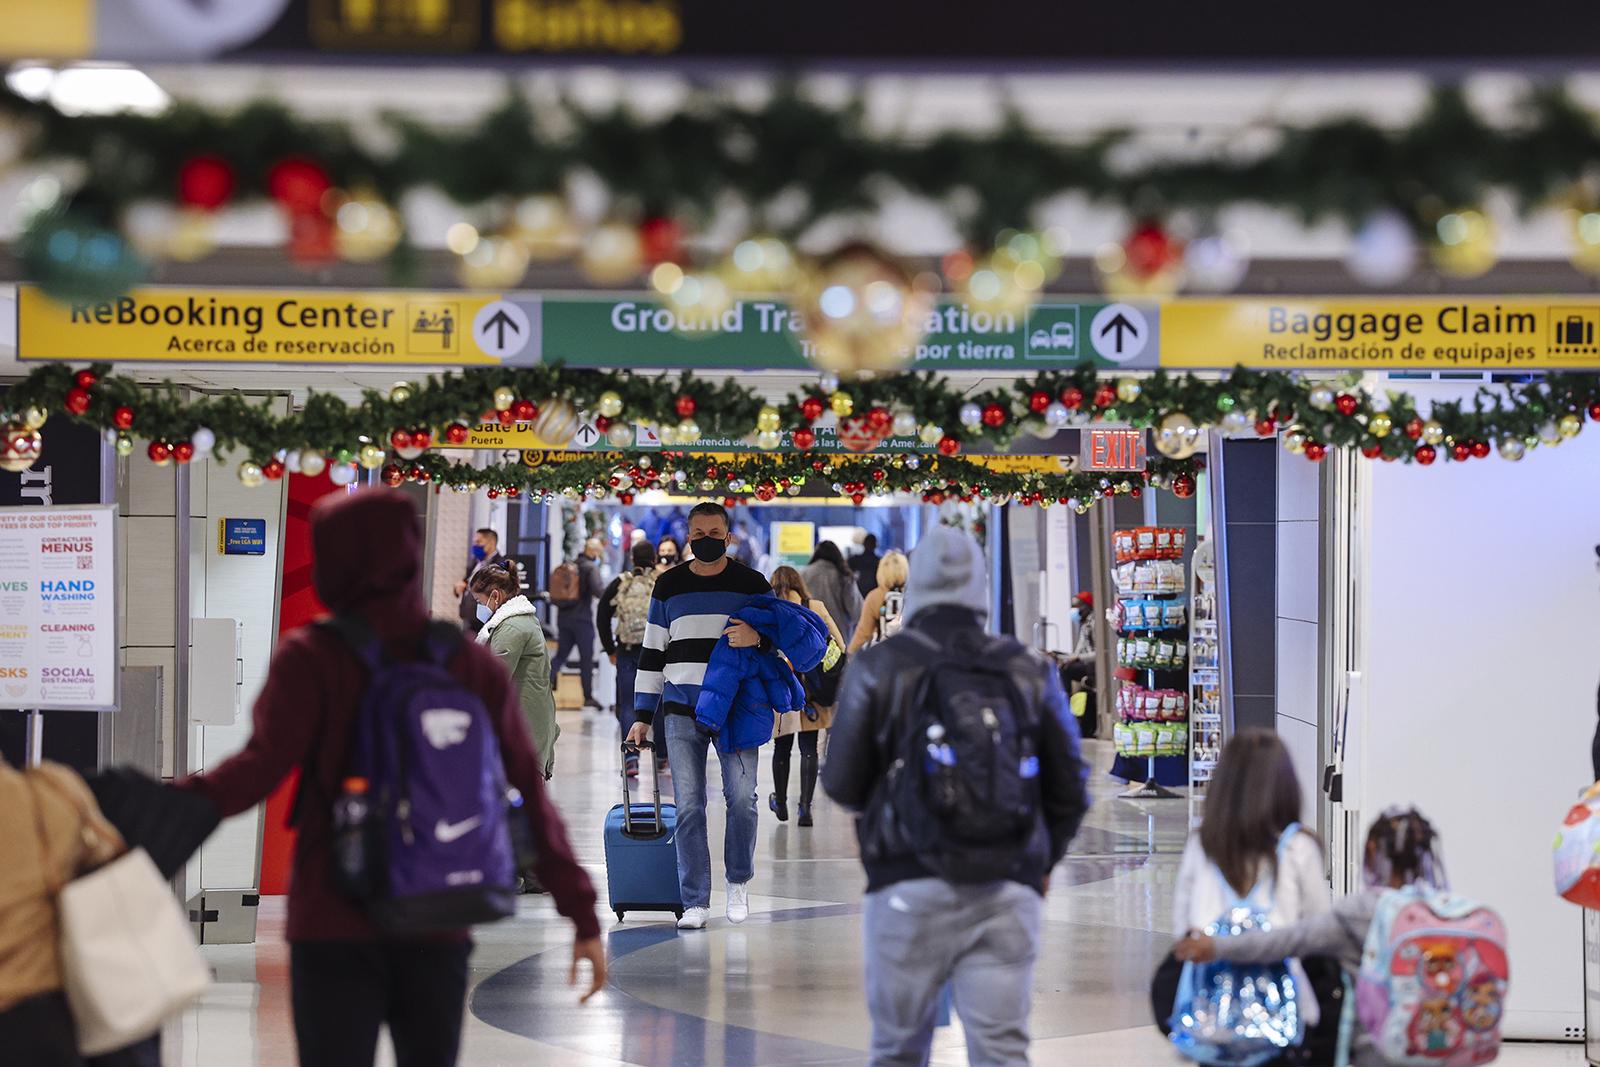 Travelers wearing protective masks walk through LaGuardia Airport (LGA) in New York, on  December 24.